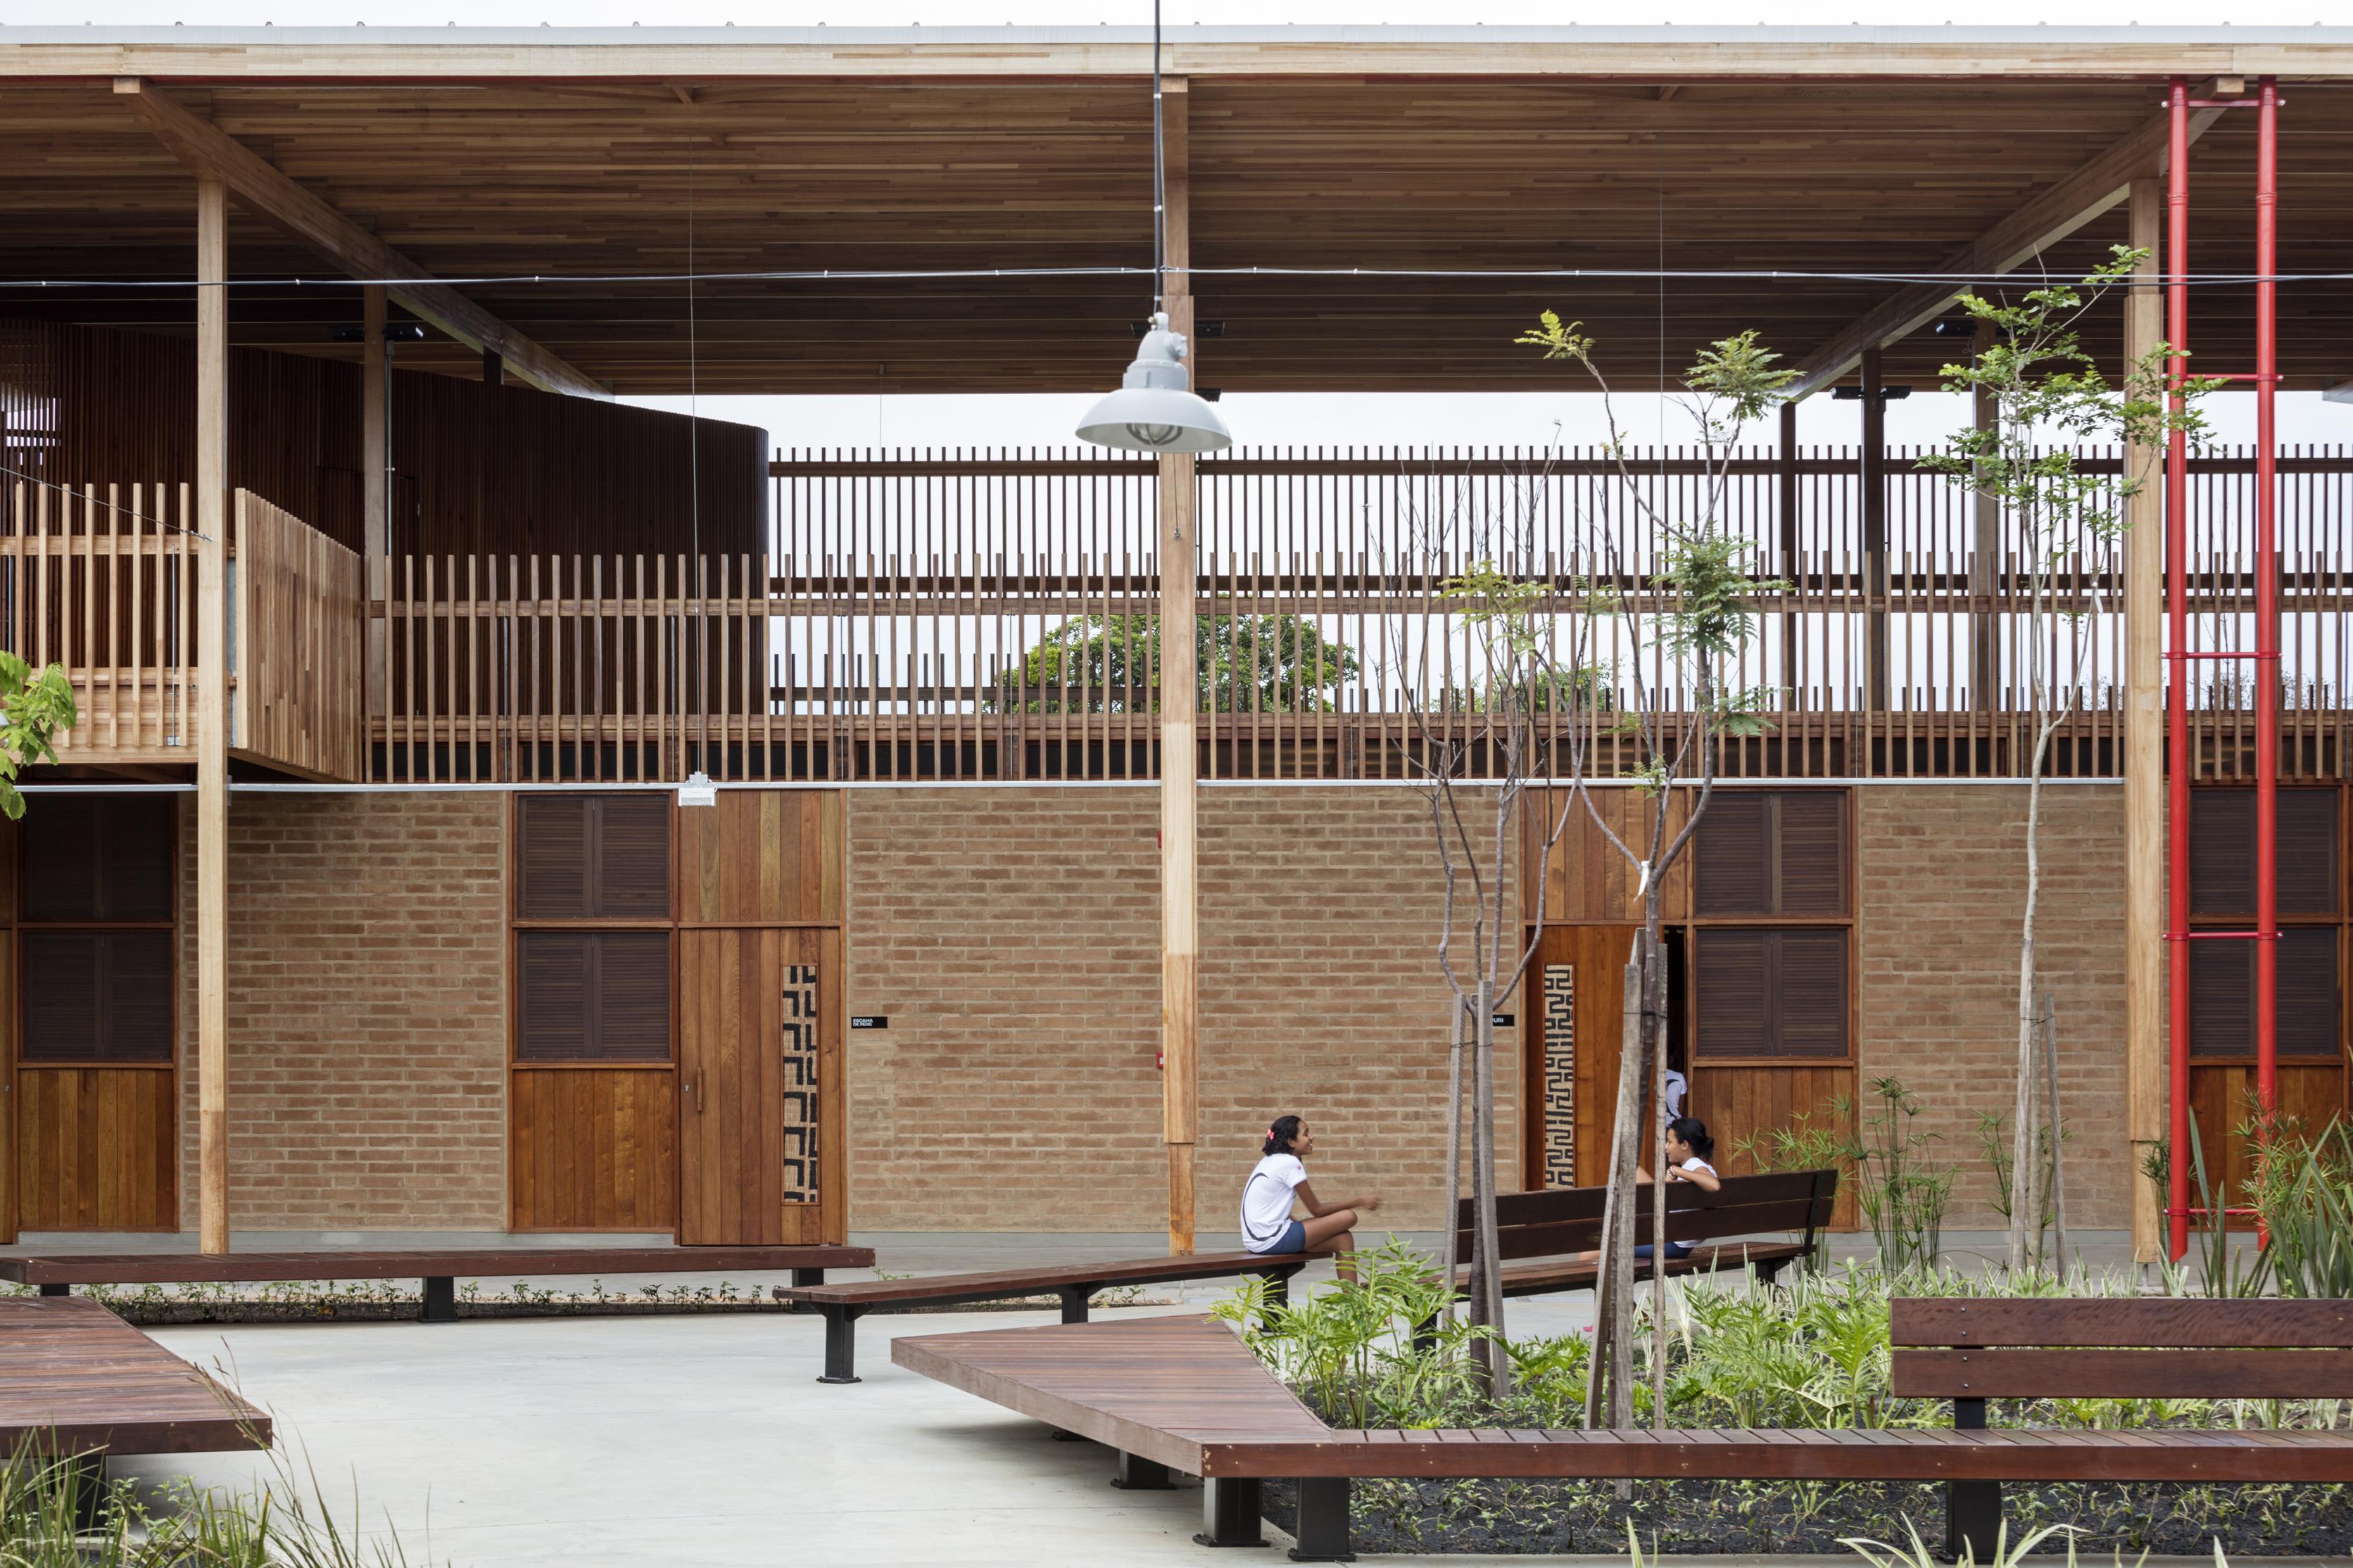 <p>Children Village,  Formoso do Araguaia &#8211; Rosenbaum &#038; Aleph Zero. beeld Fazenda Canuanã</p>